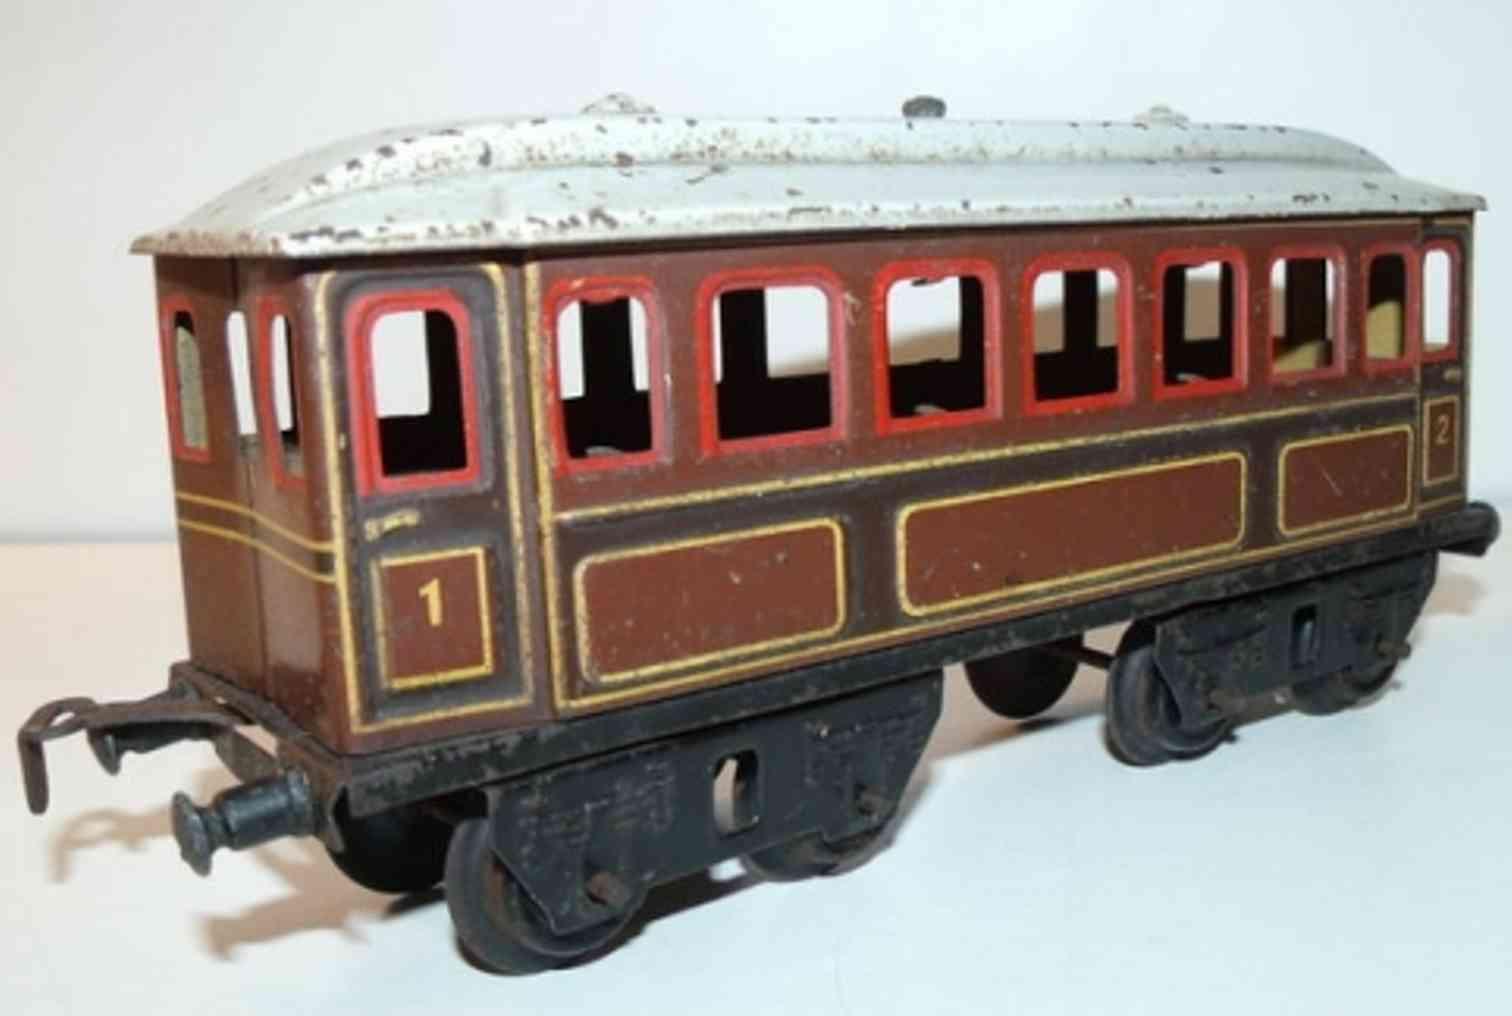 doll 5/582 braun railway toy passenger car 1 2 brown gauge 0